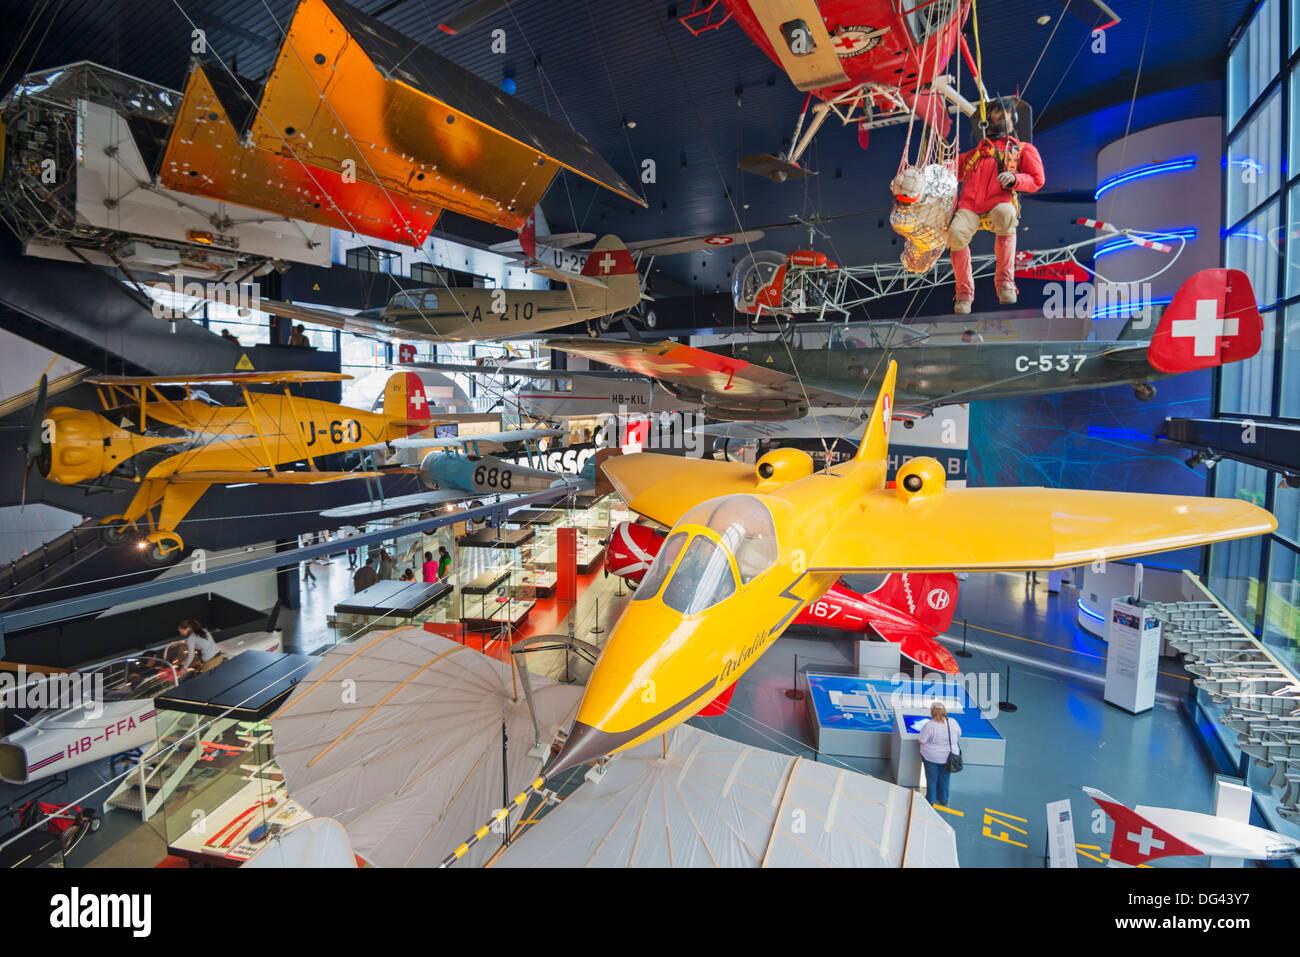 Aircraft at Verkehrshaus transport museum, Lucerne, Switzerland, Europe - Stock Image